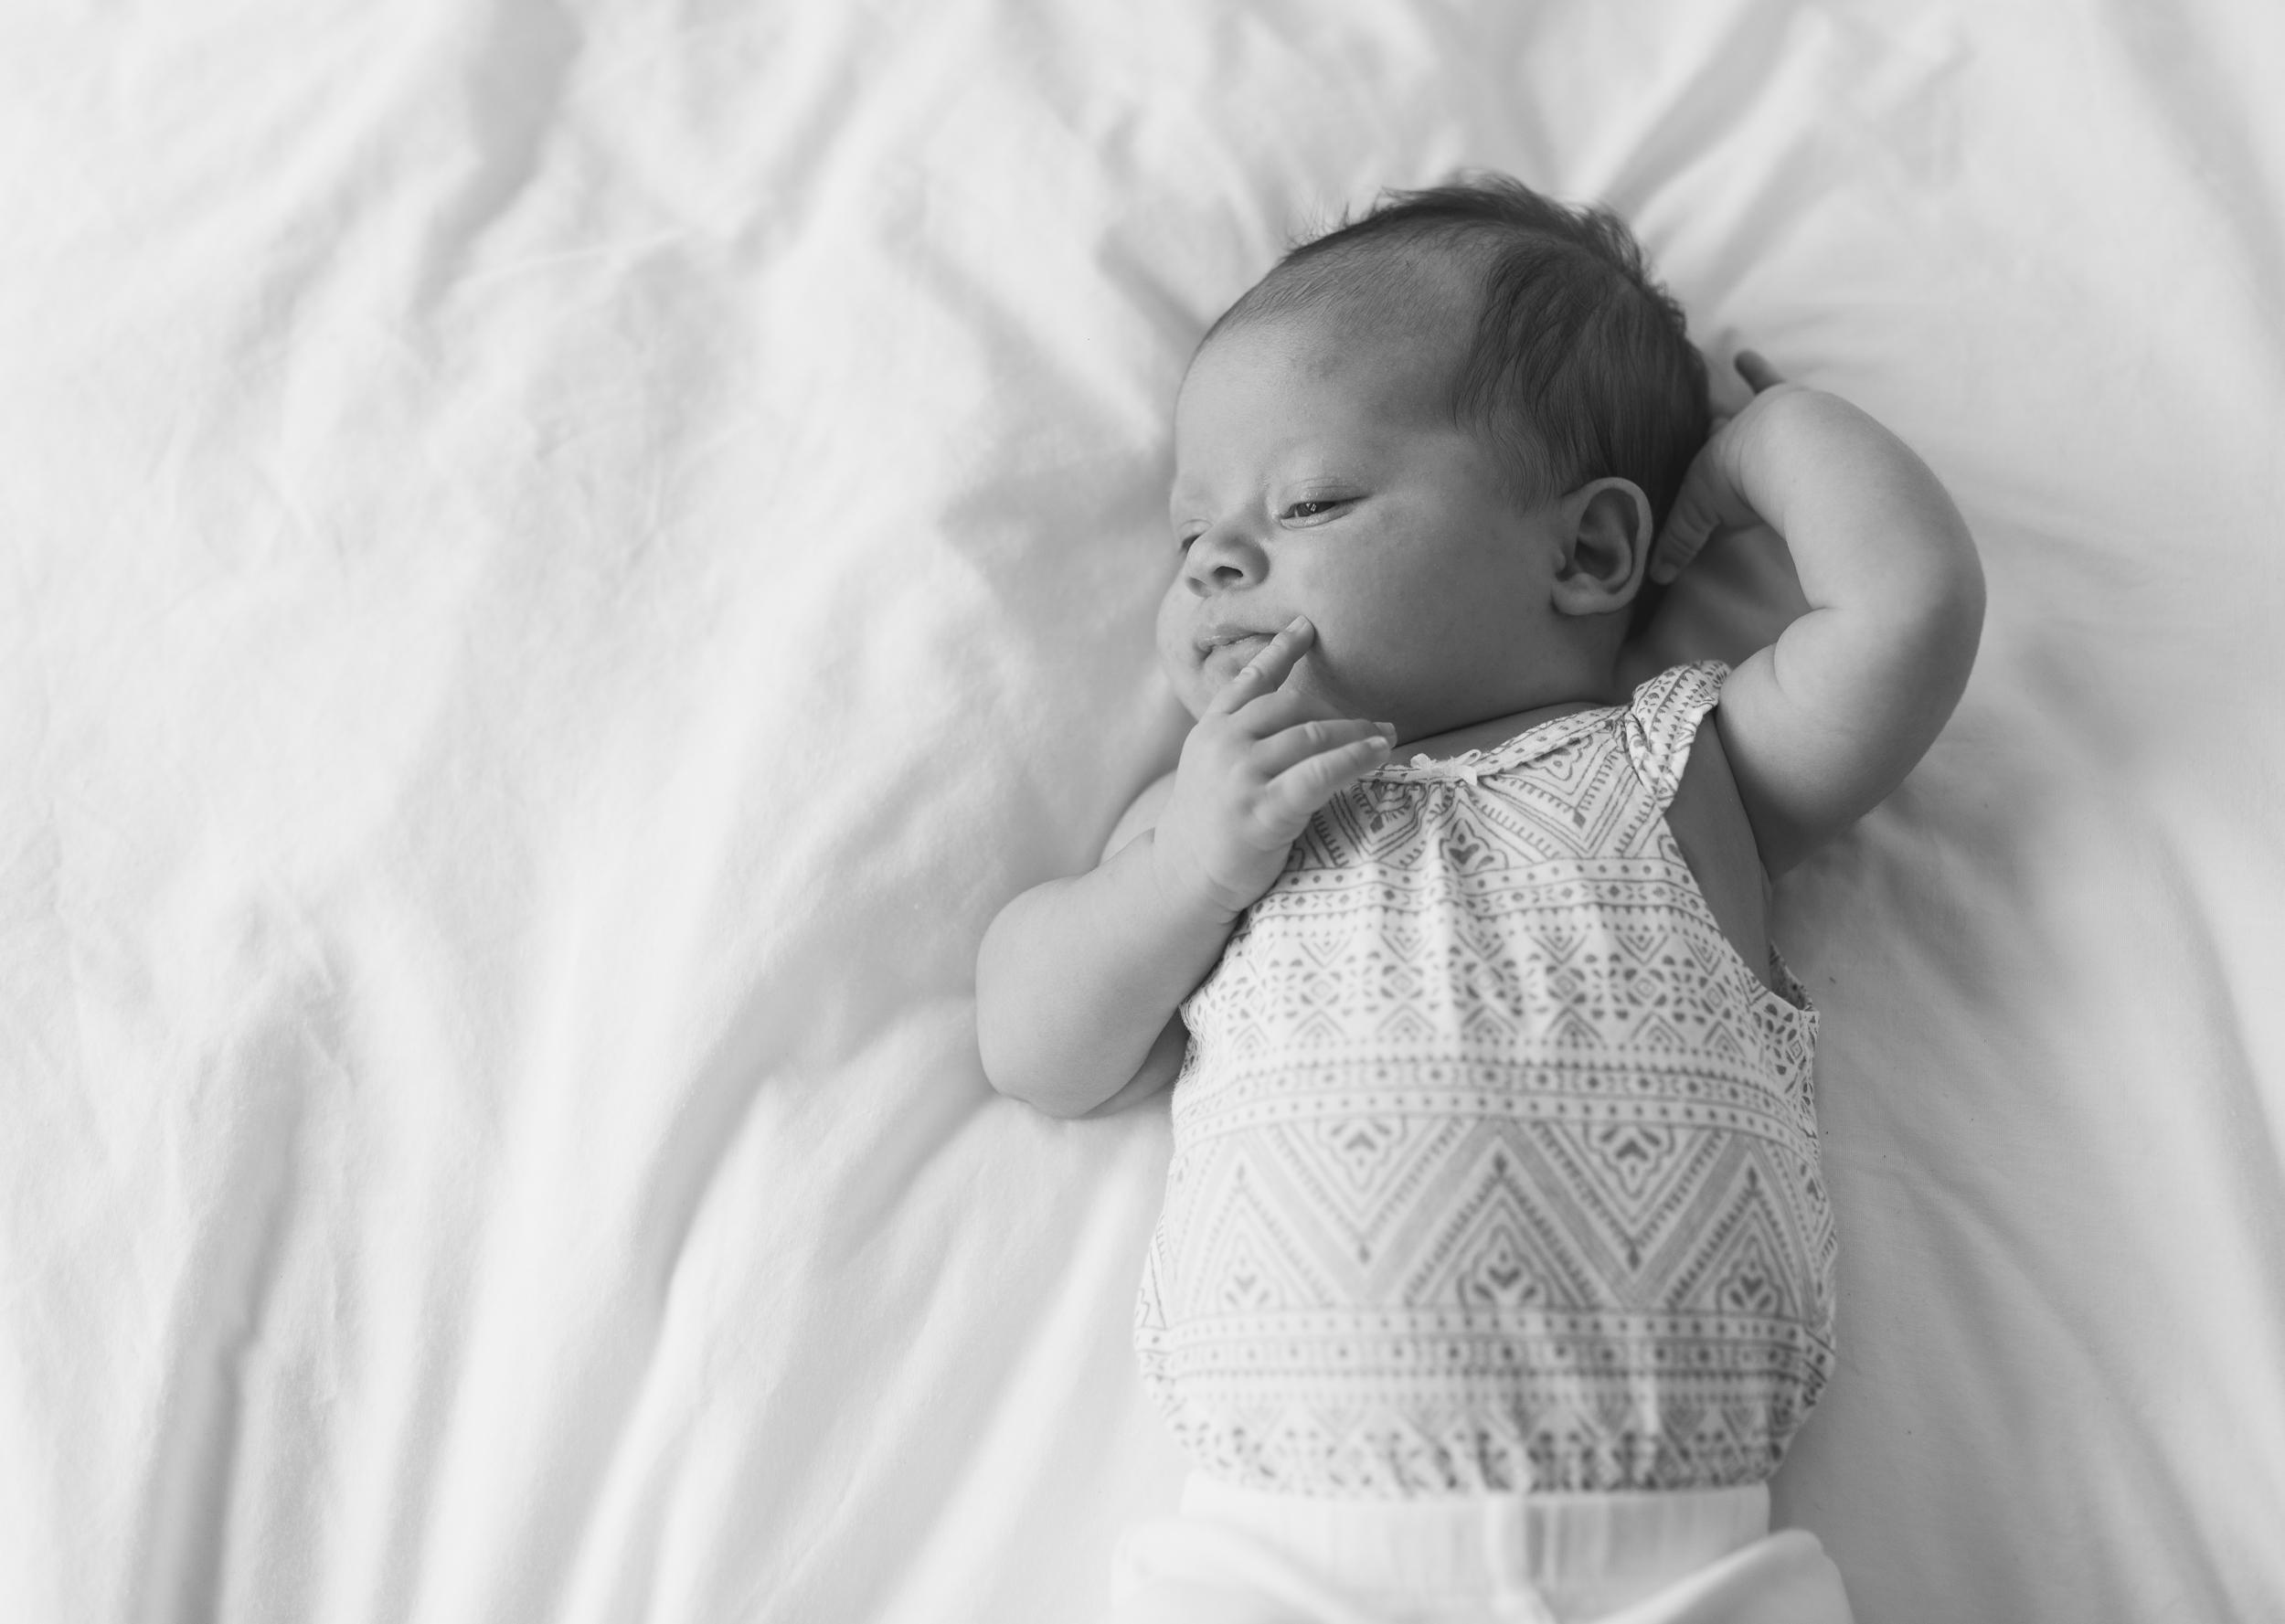 baby-year-one-motherhood-roxanne-augusta-guam-photography-6.jpg